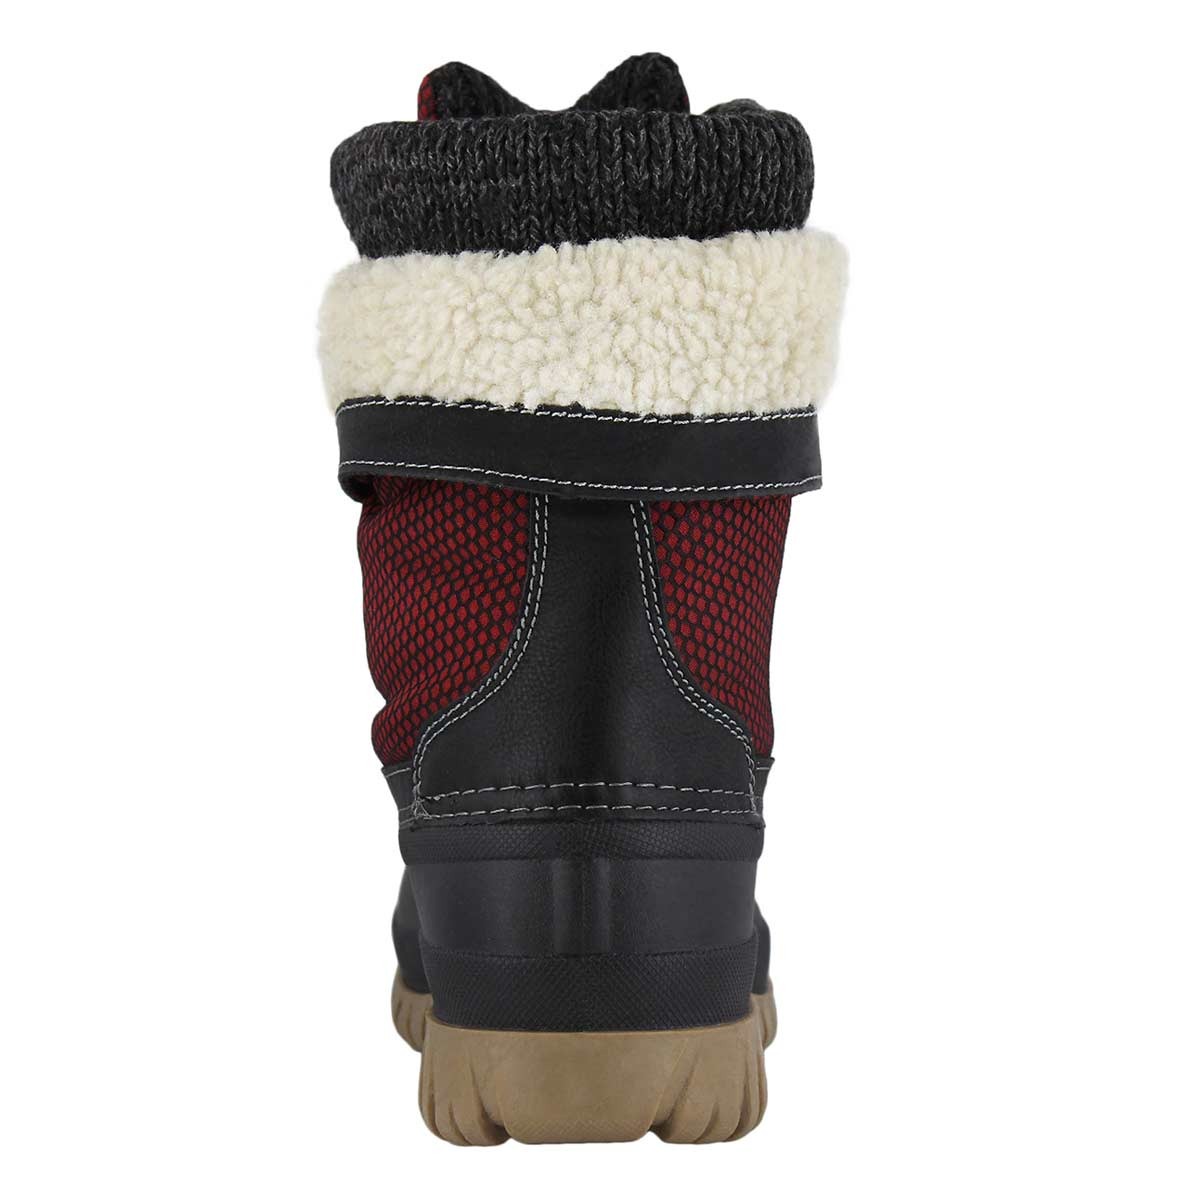 Lds Creek red wtpf winter boot